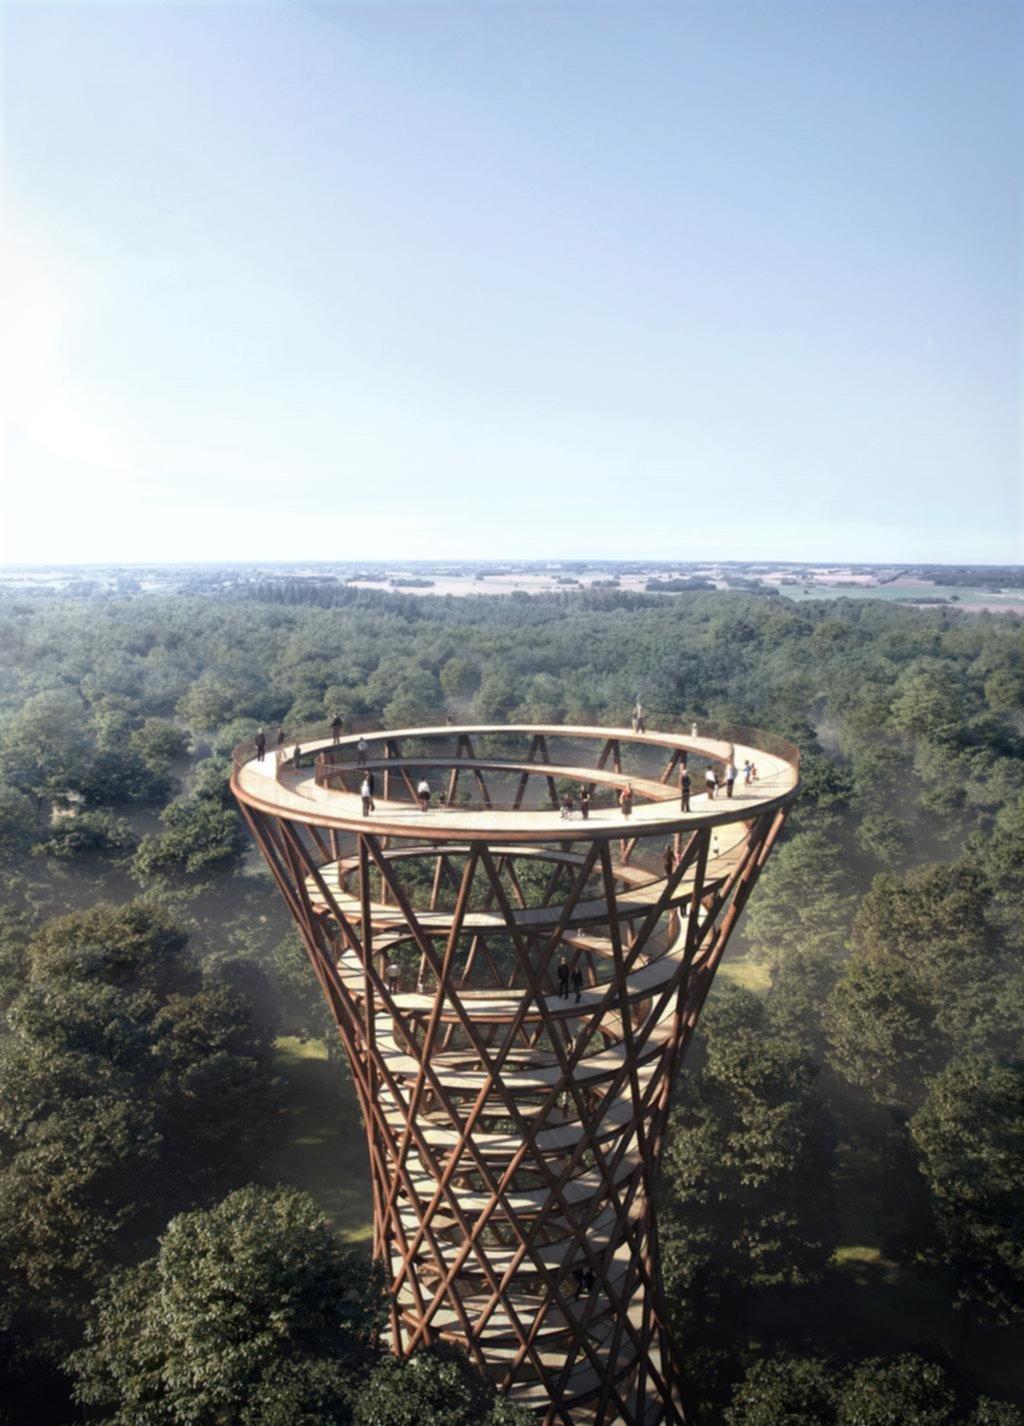 La torre del bosque